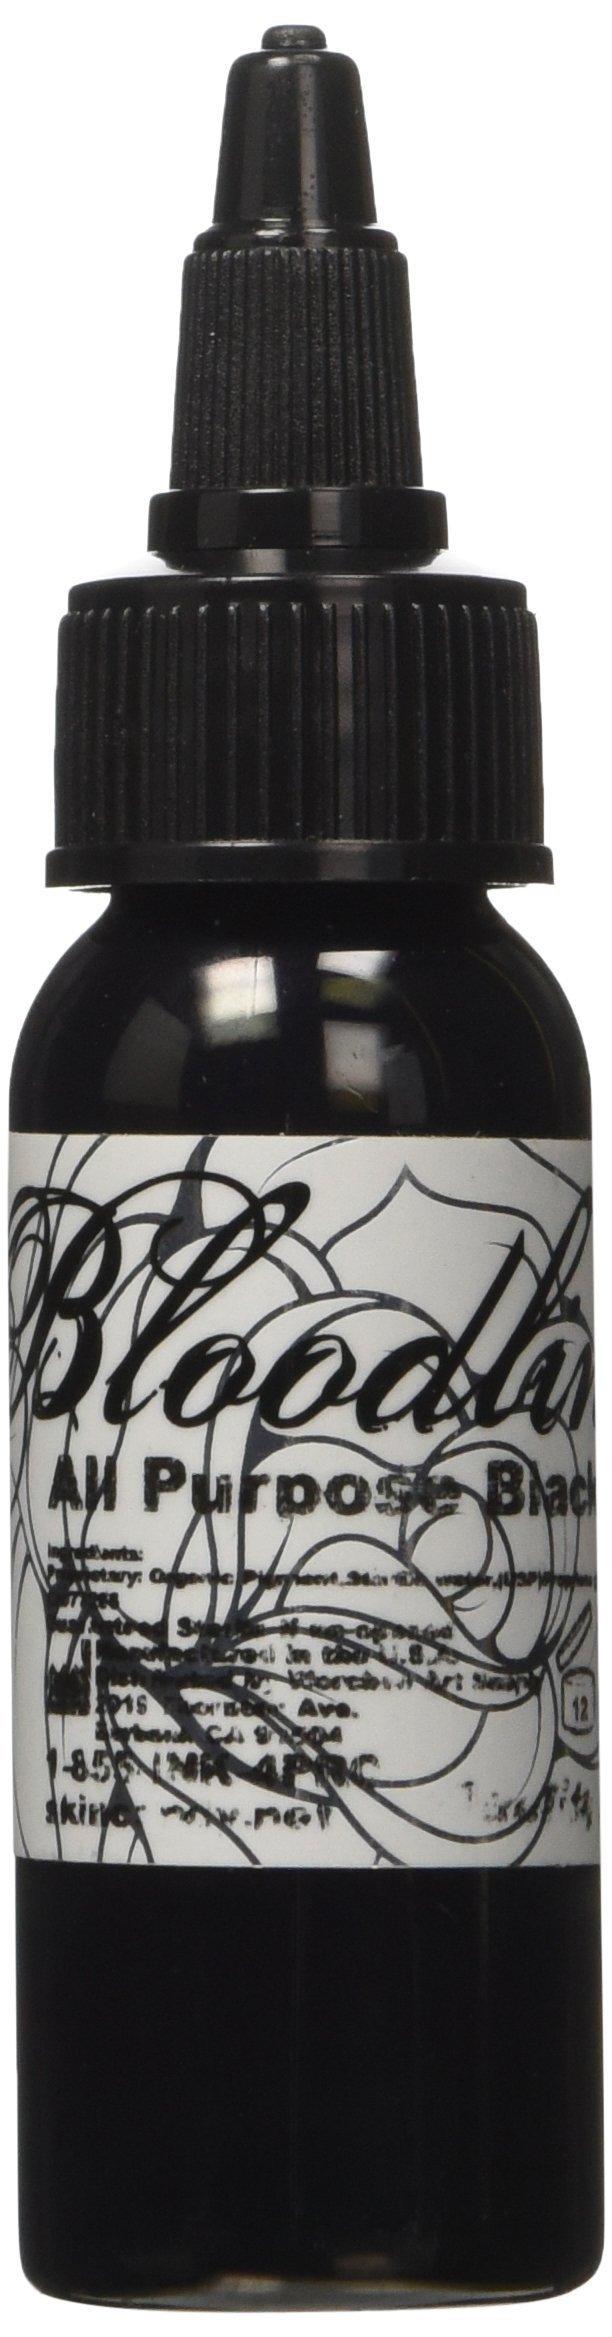 Bloodline Tattoo Ink - All Purpose Black - 1 ounce  (29 milliliter)